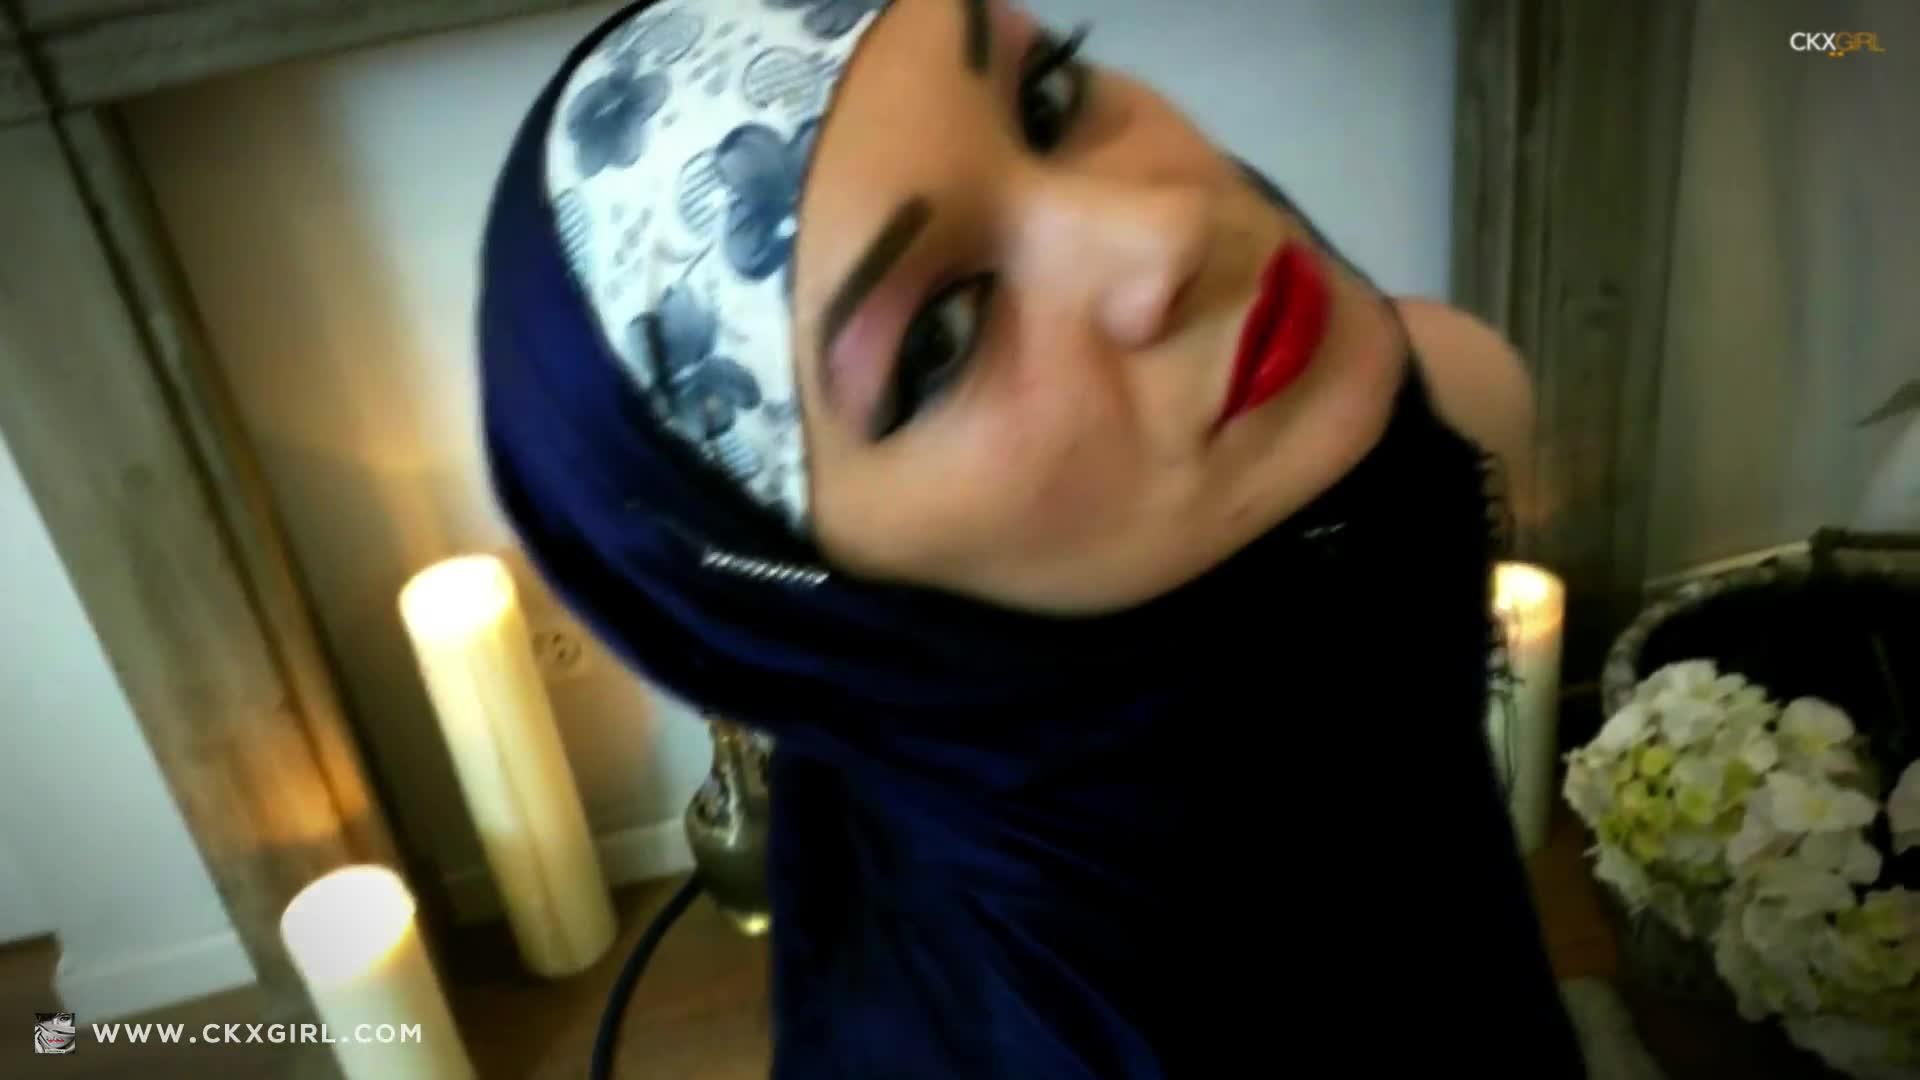 daliyamuslim   ckxgirl™   live muslim webcam   www.ckxgirl